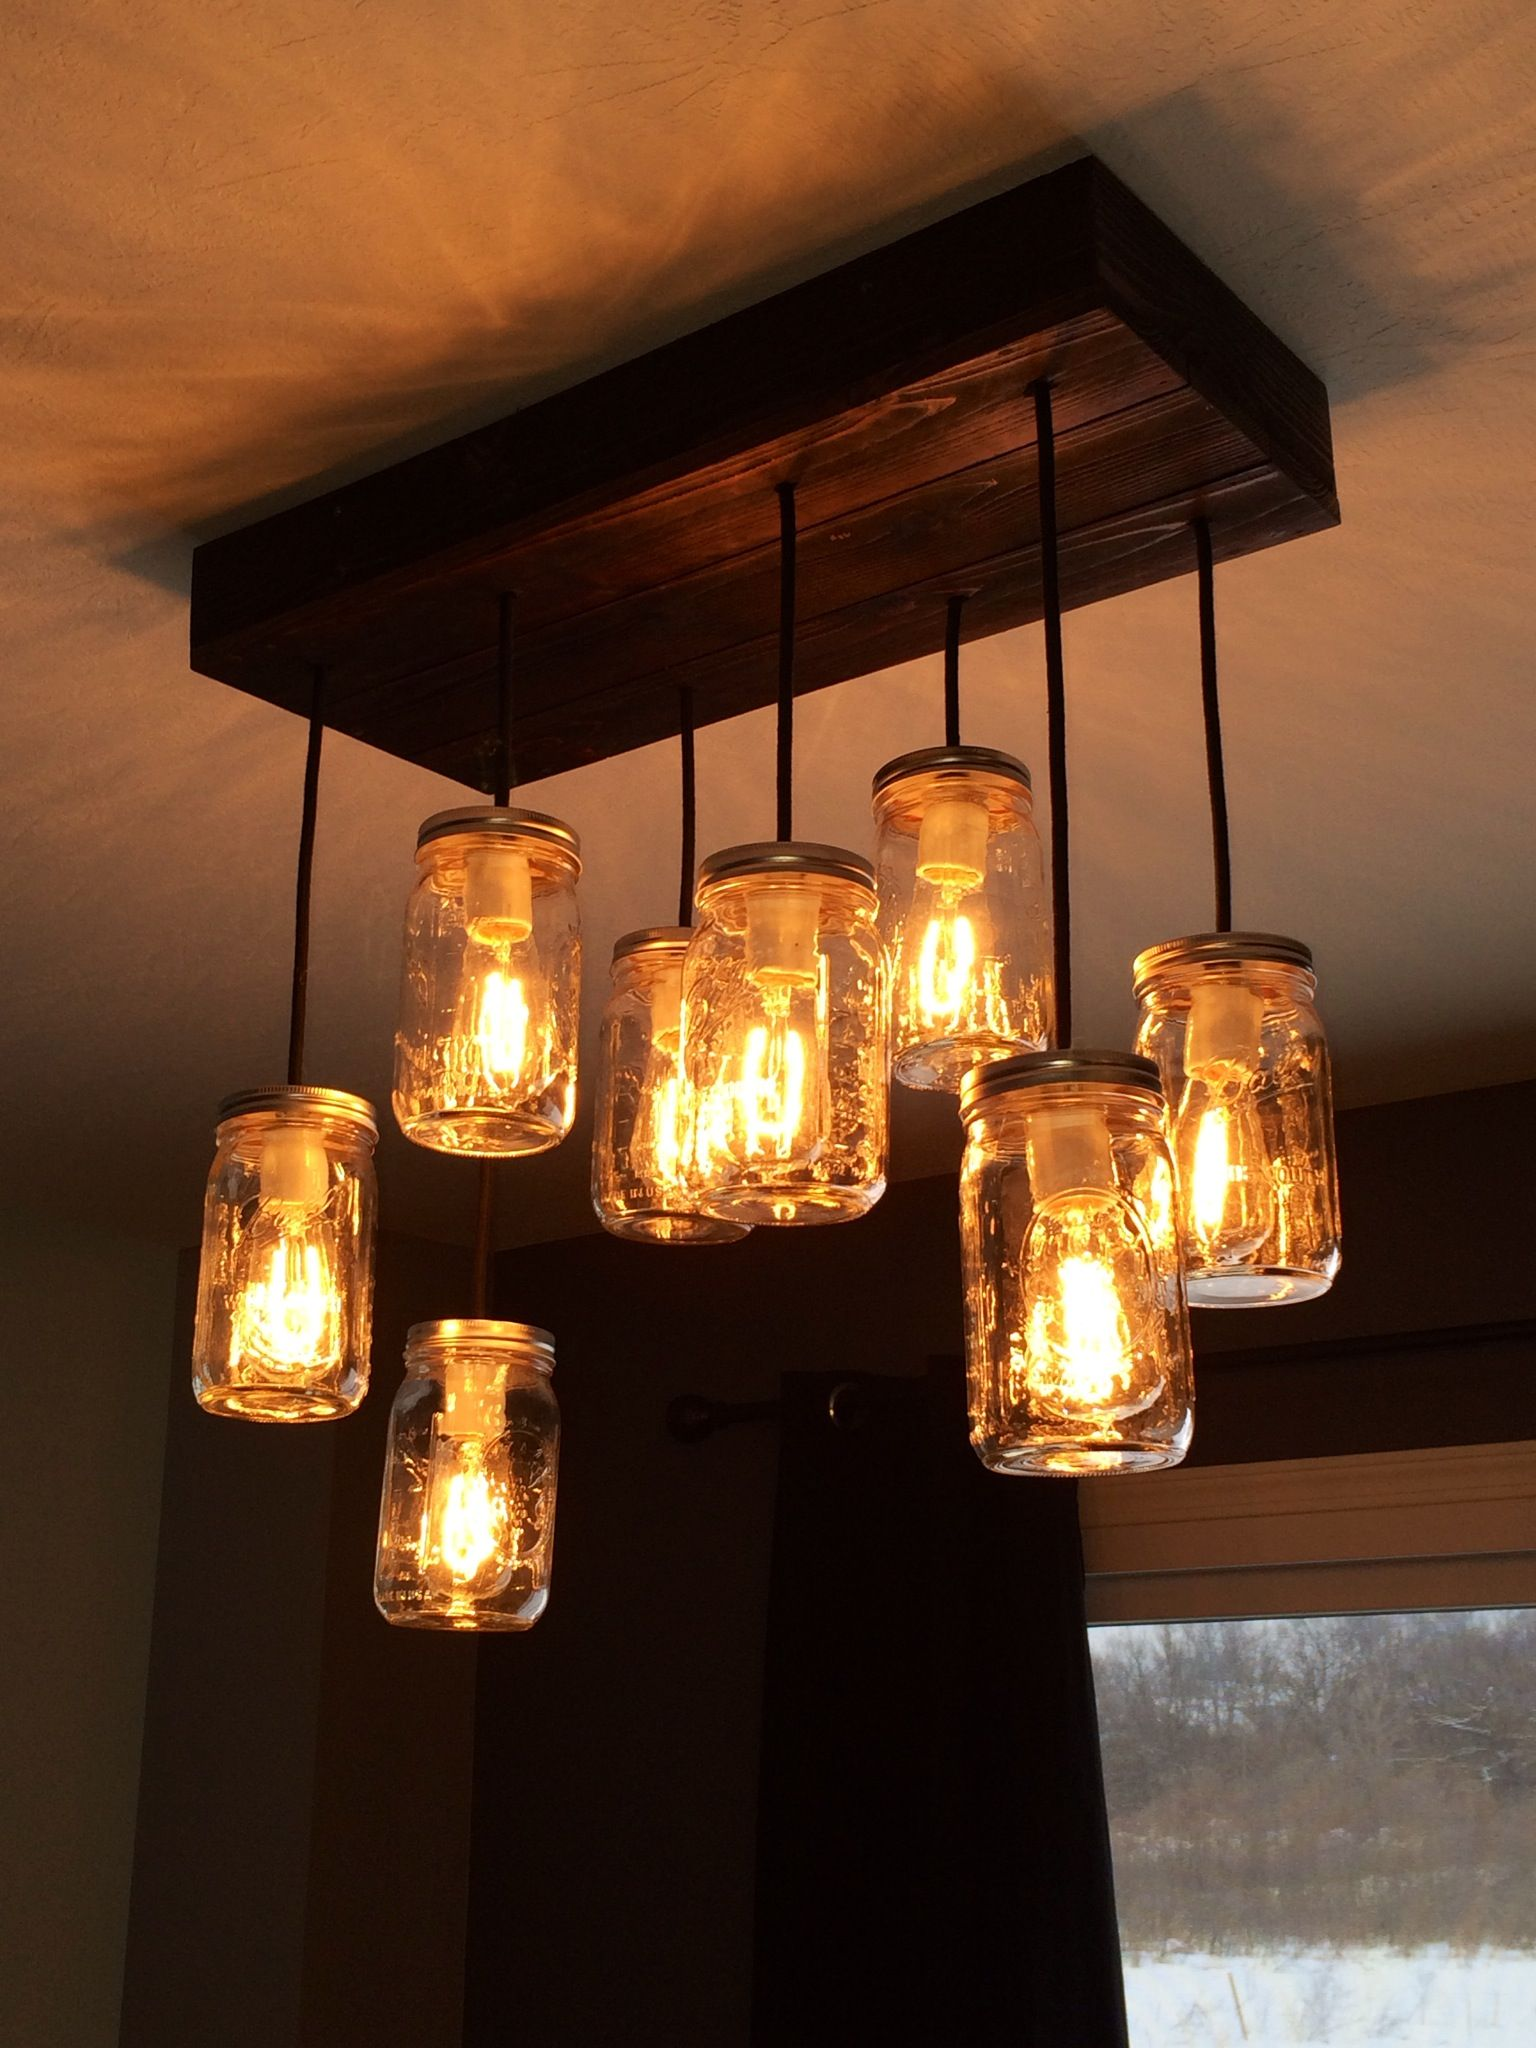 1930s Structural Beam Edison Bulb Light Fixture Project Edison